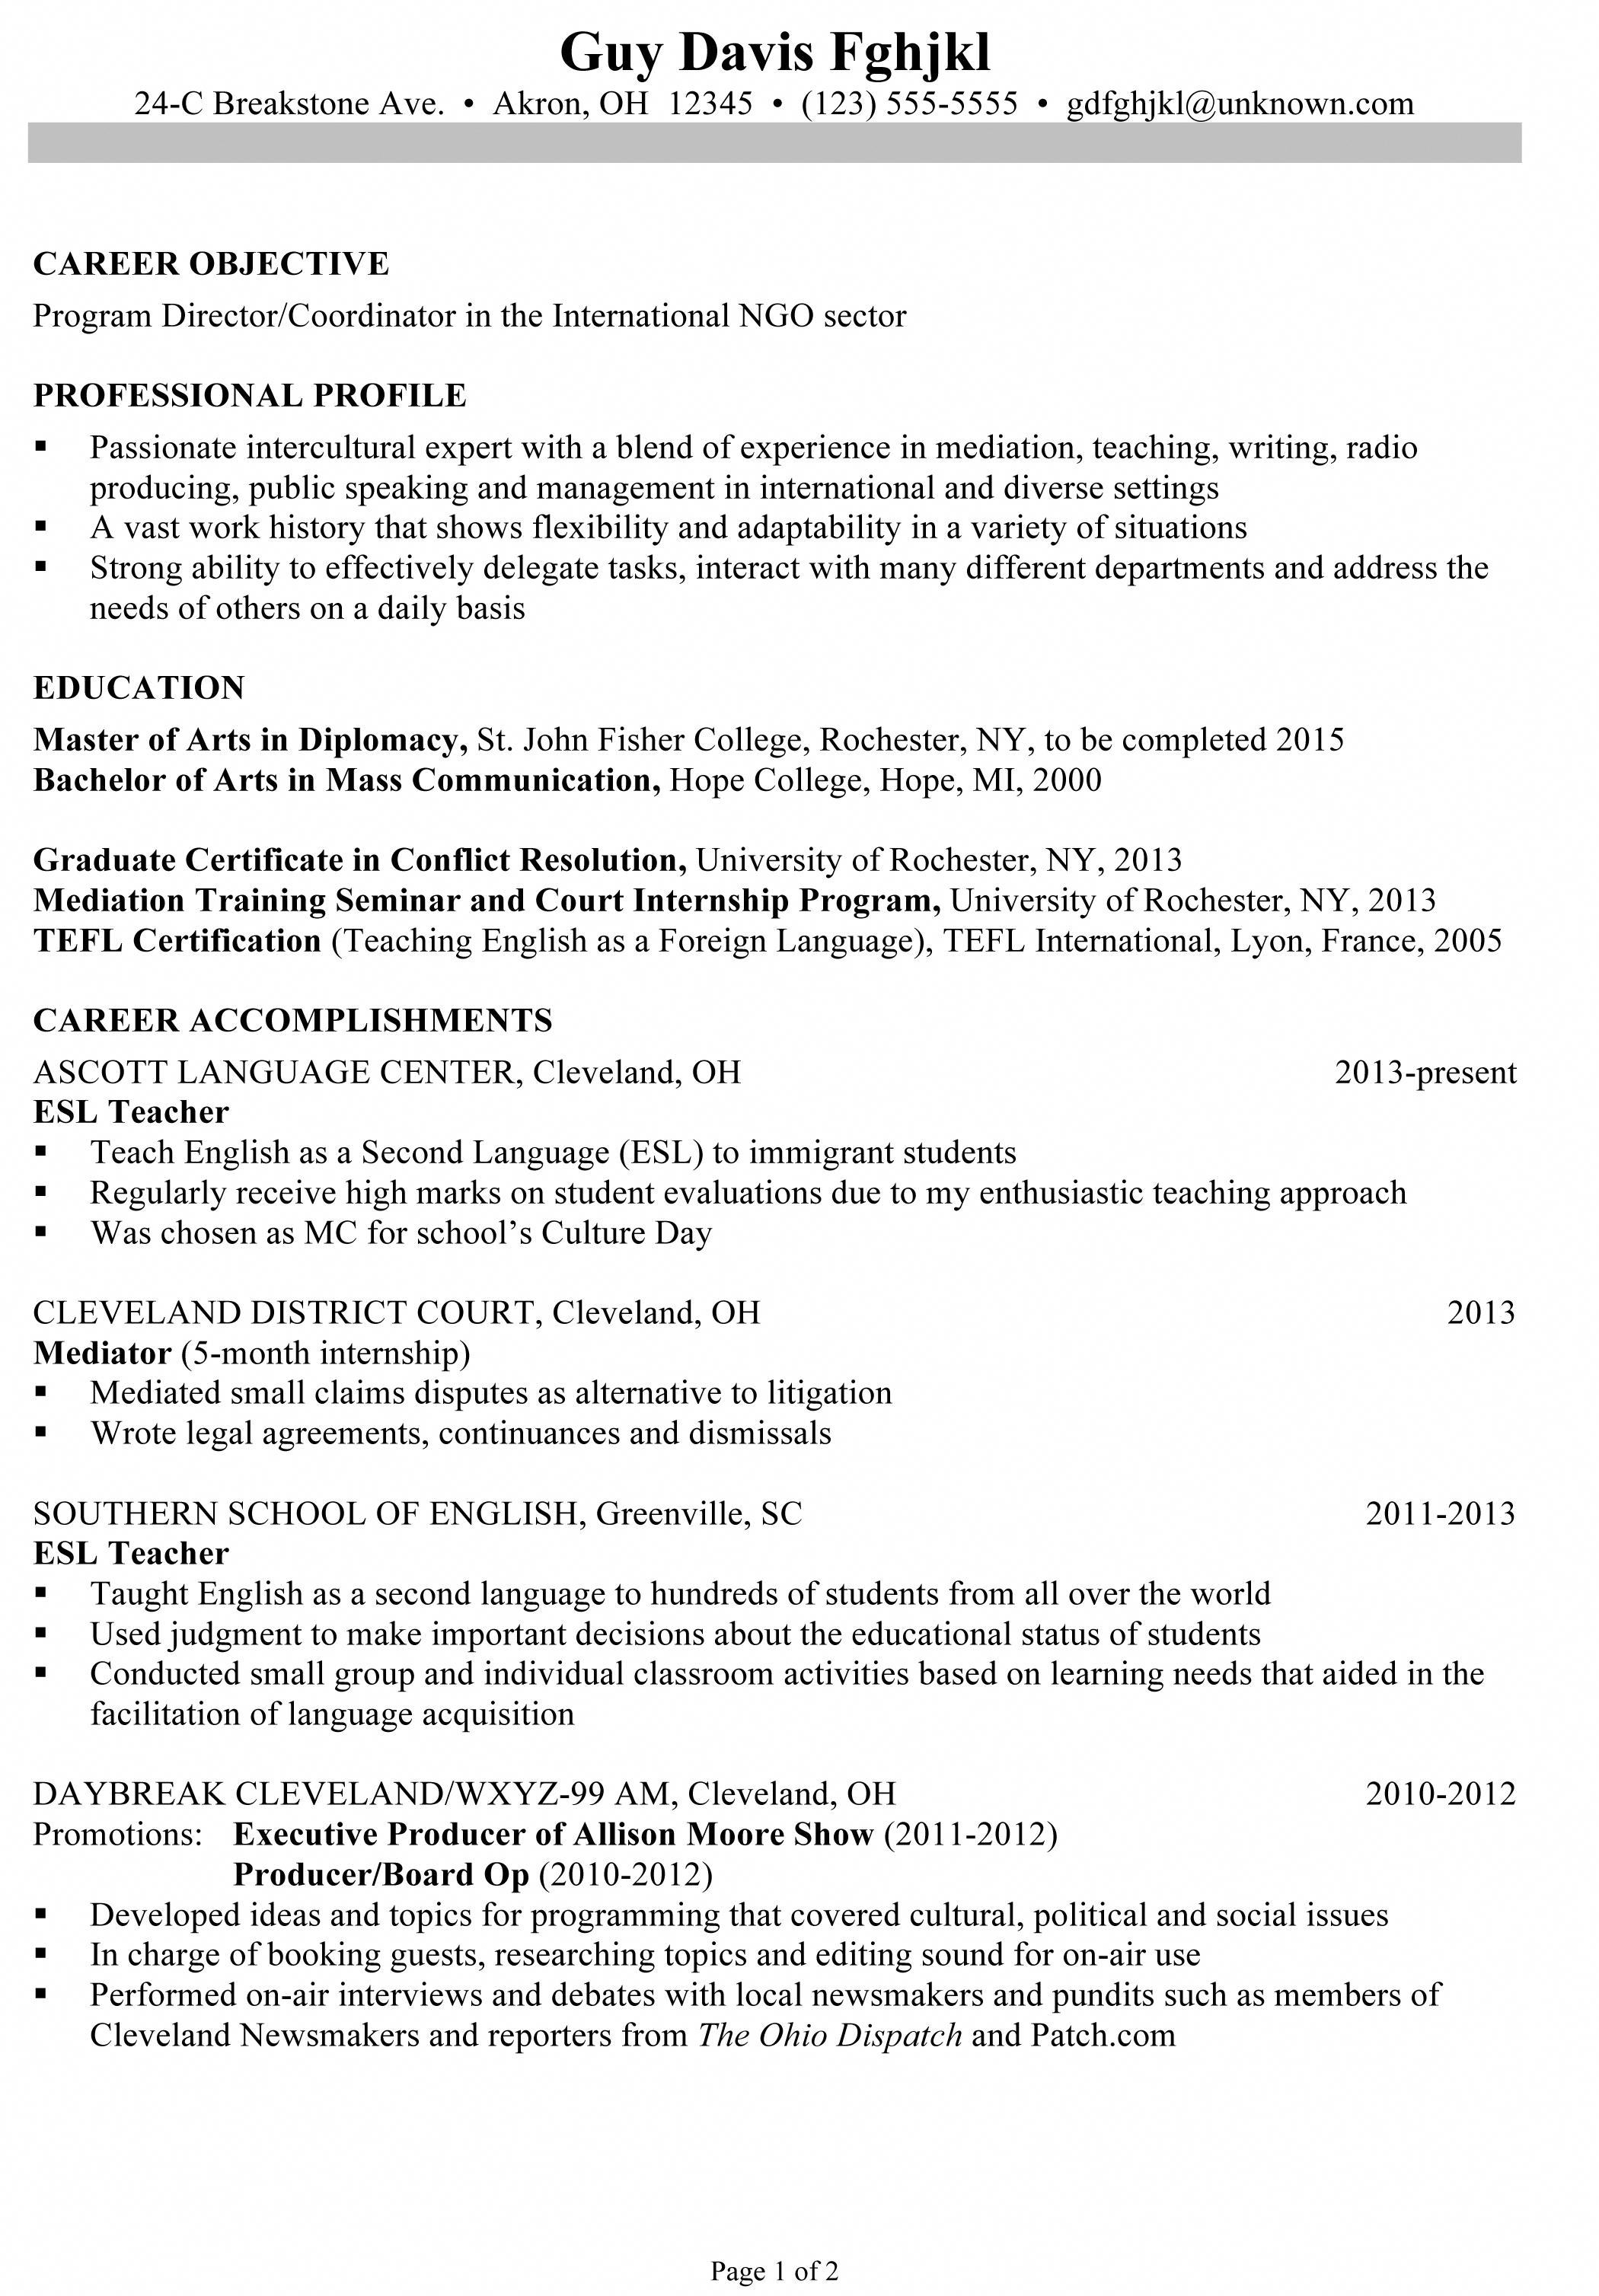 Professional Summary Resume Example Best Templatesample Resumes